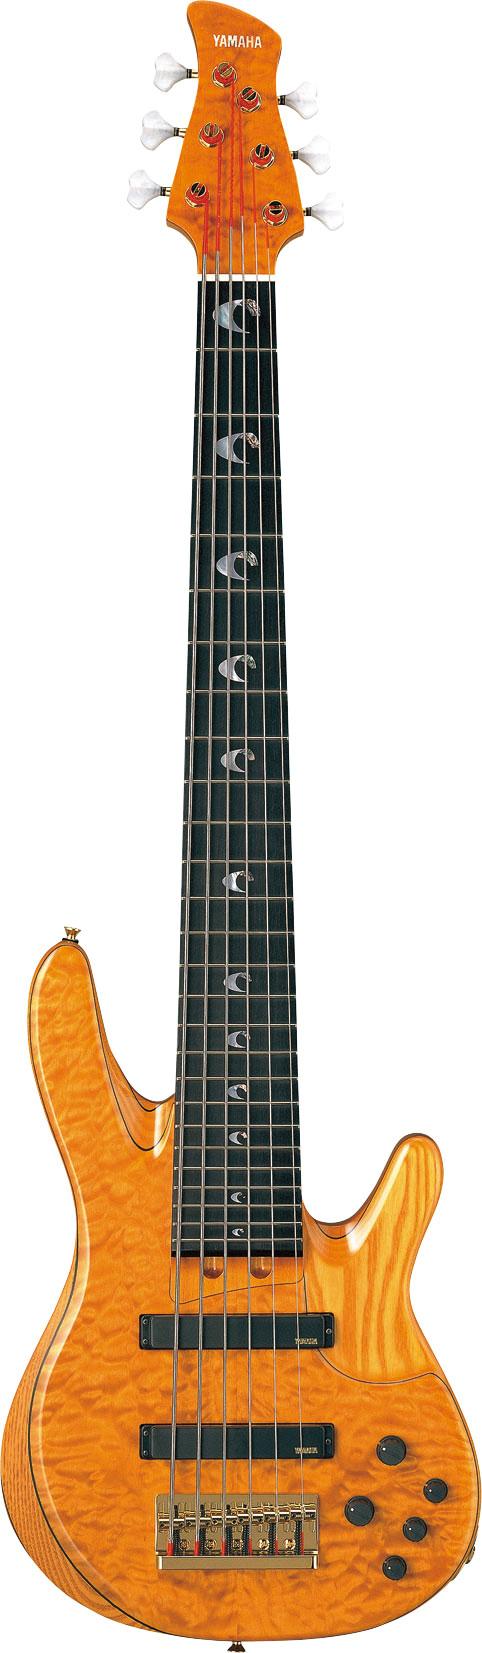 Yamaha trbjp2 39 john patitucci 39 6 string bass guitar in for Yamaha 6 string bass